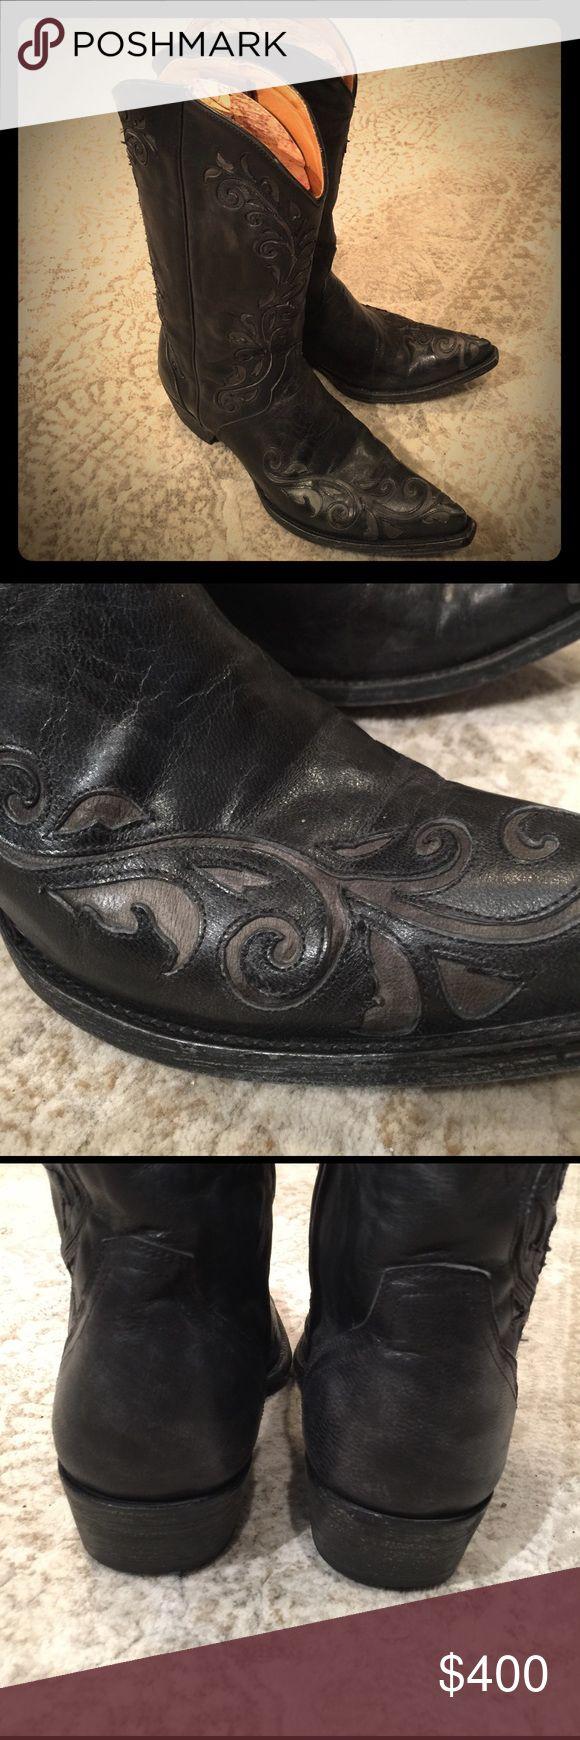 Spotted while shopping on Poshmark: Old Gringo Estere Boots! #poshmark #fashion #shopping #style #Old Gringo #Shoes